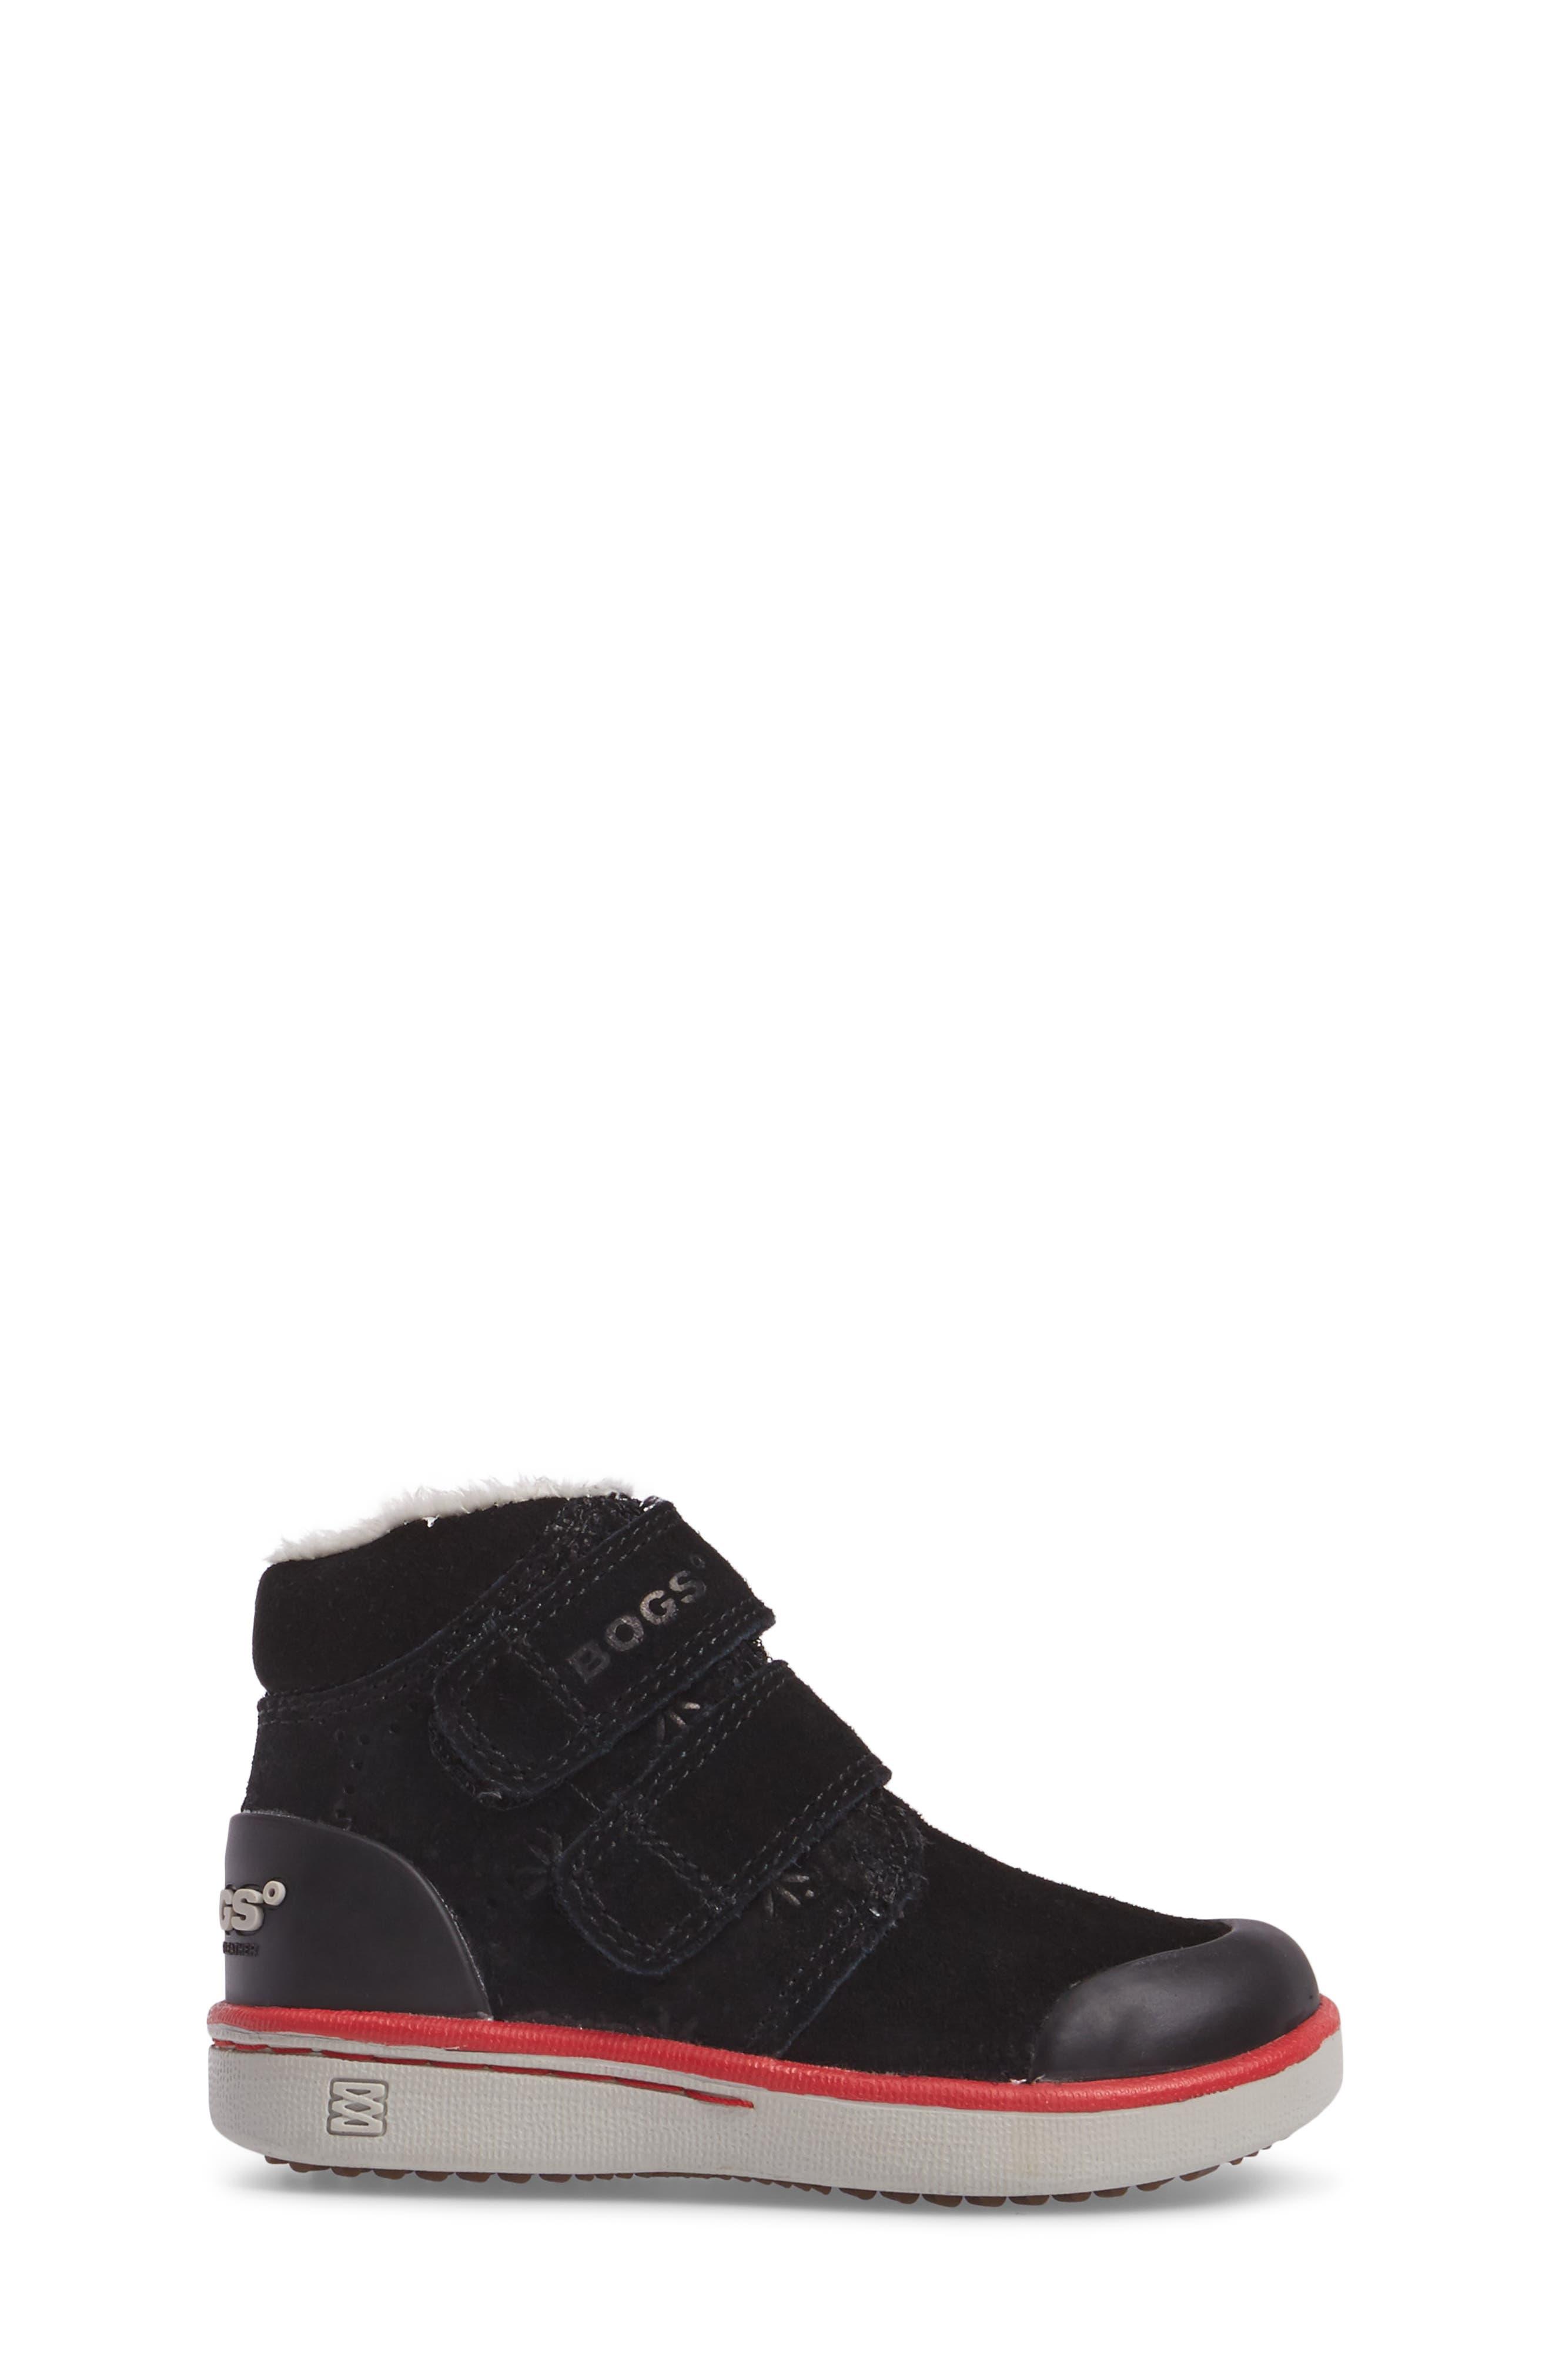 Samantha Faux Fur Waterproof Boot,                             Alternate thumbnail 3, color,                             Black/ Black